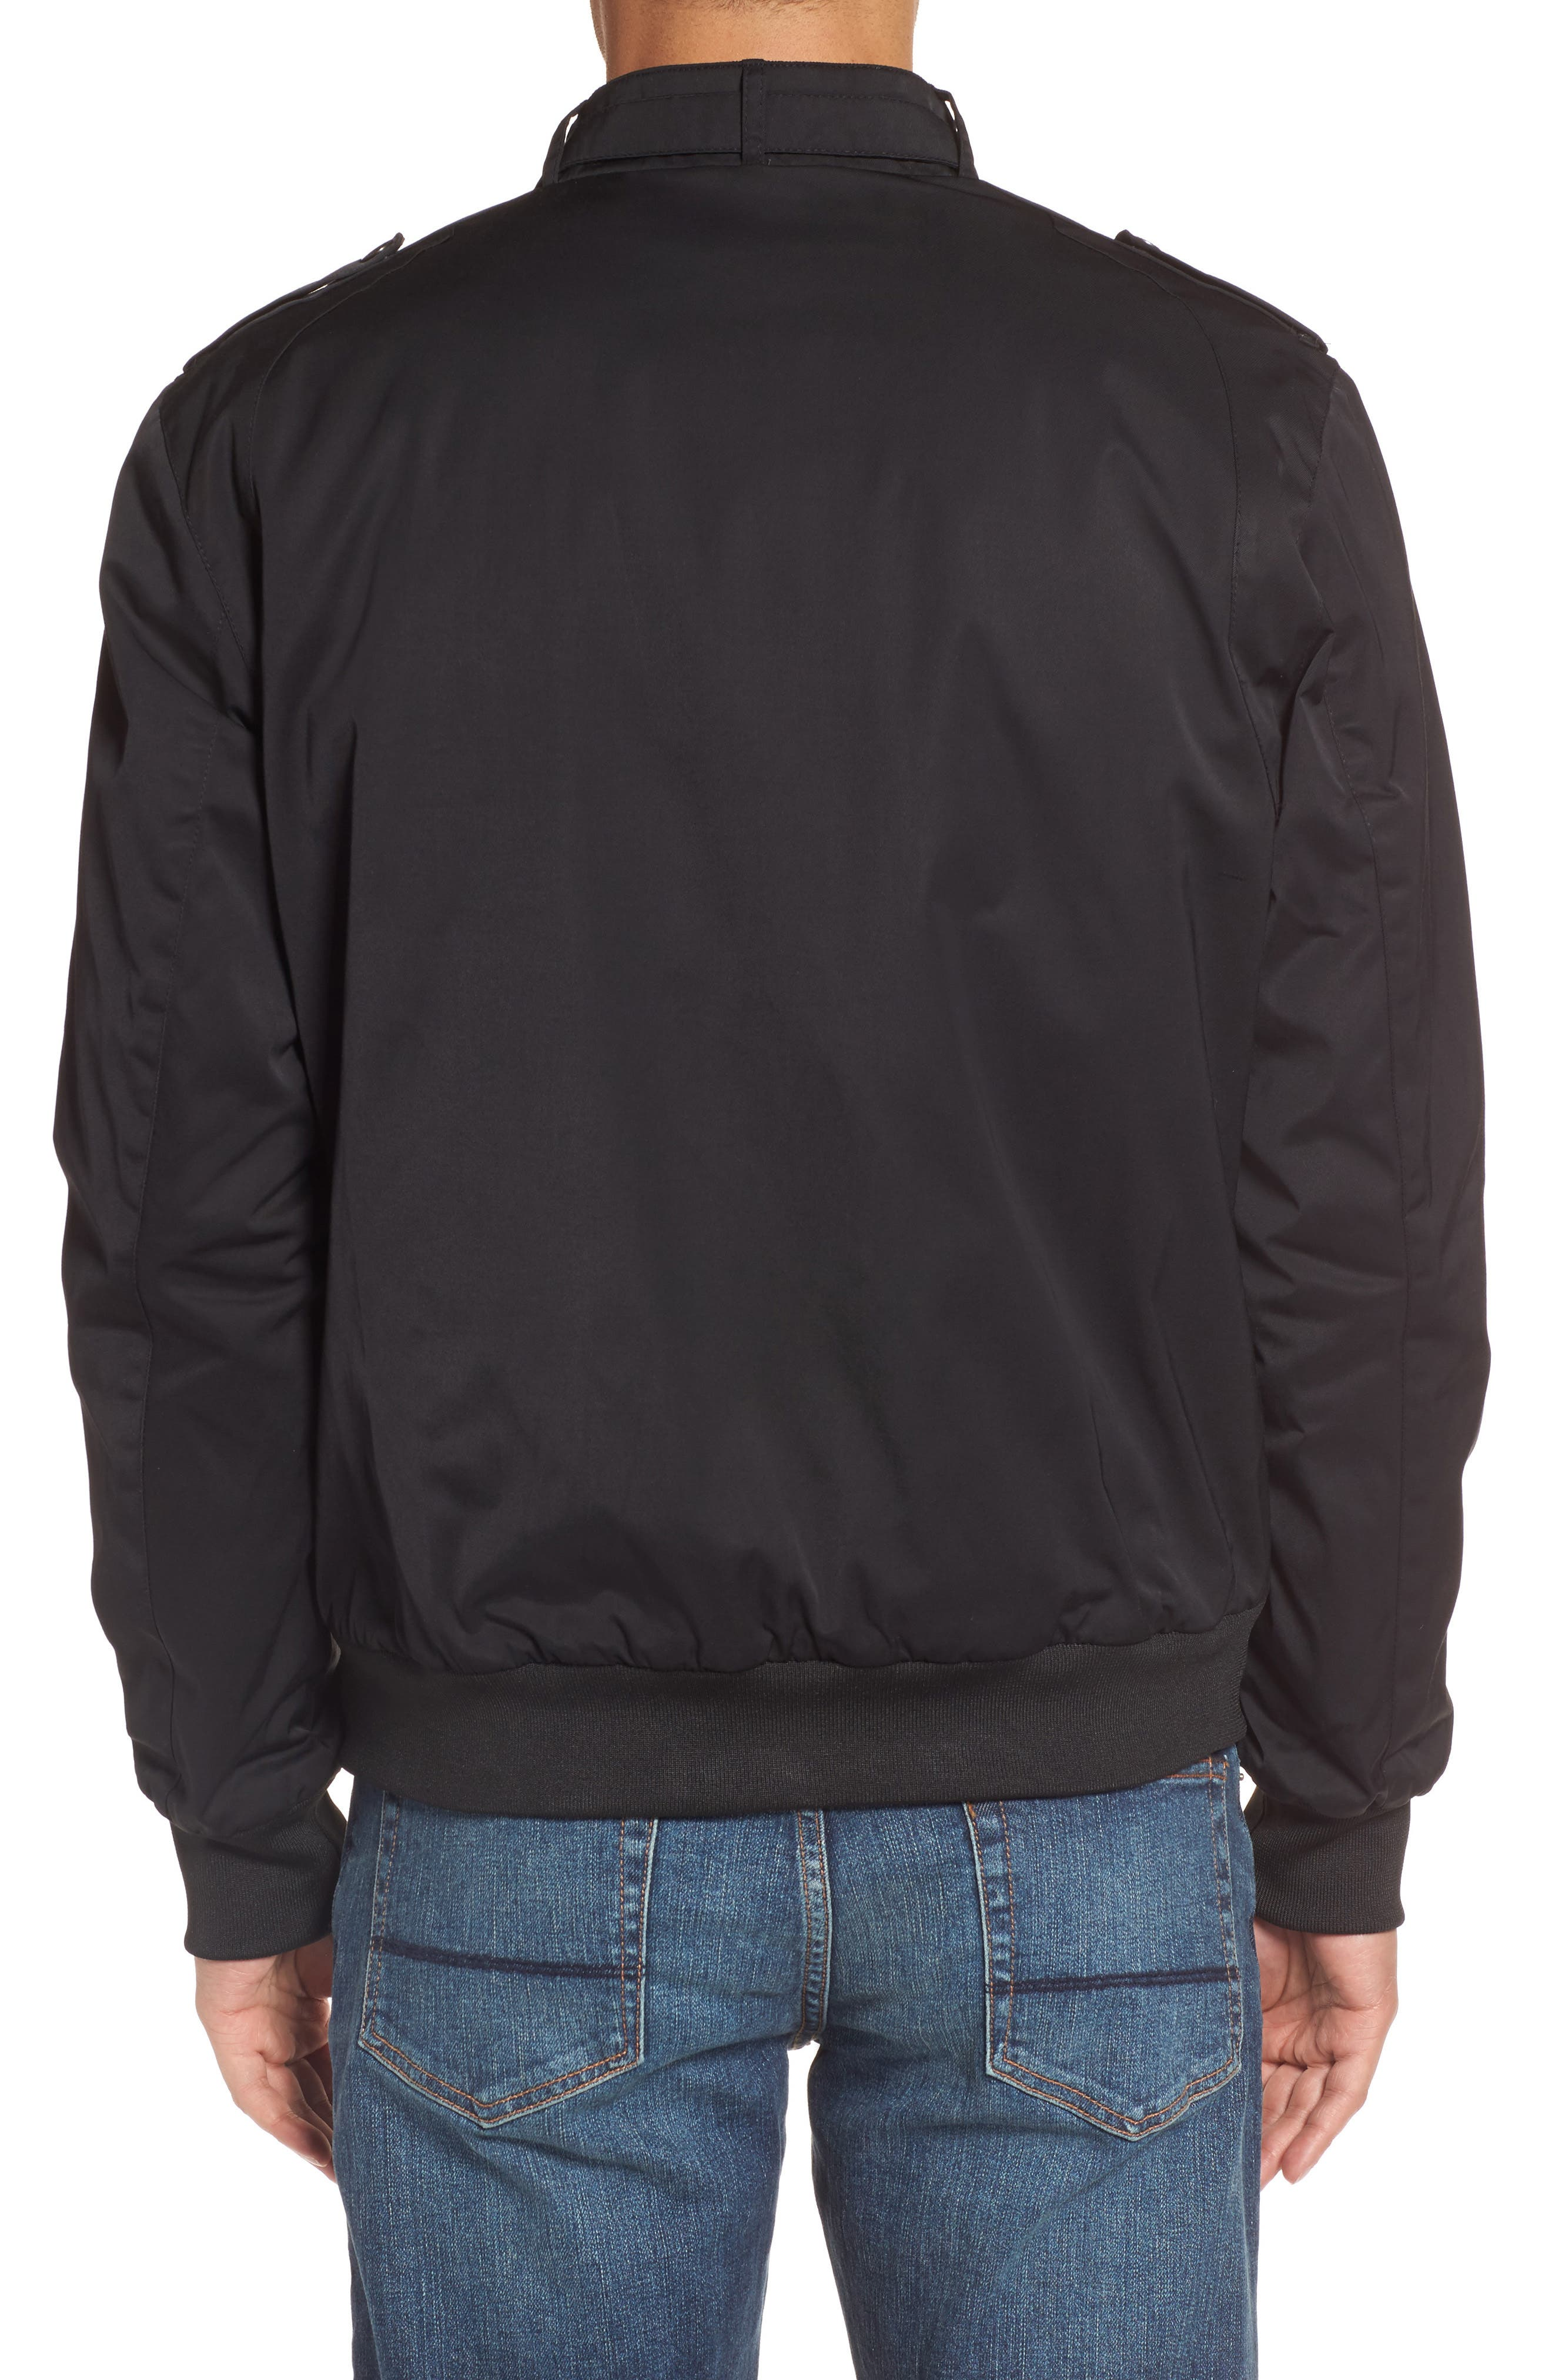 Twill Iconic Jacket,                             Alternate thumbnail 2, color,                             001